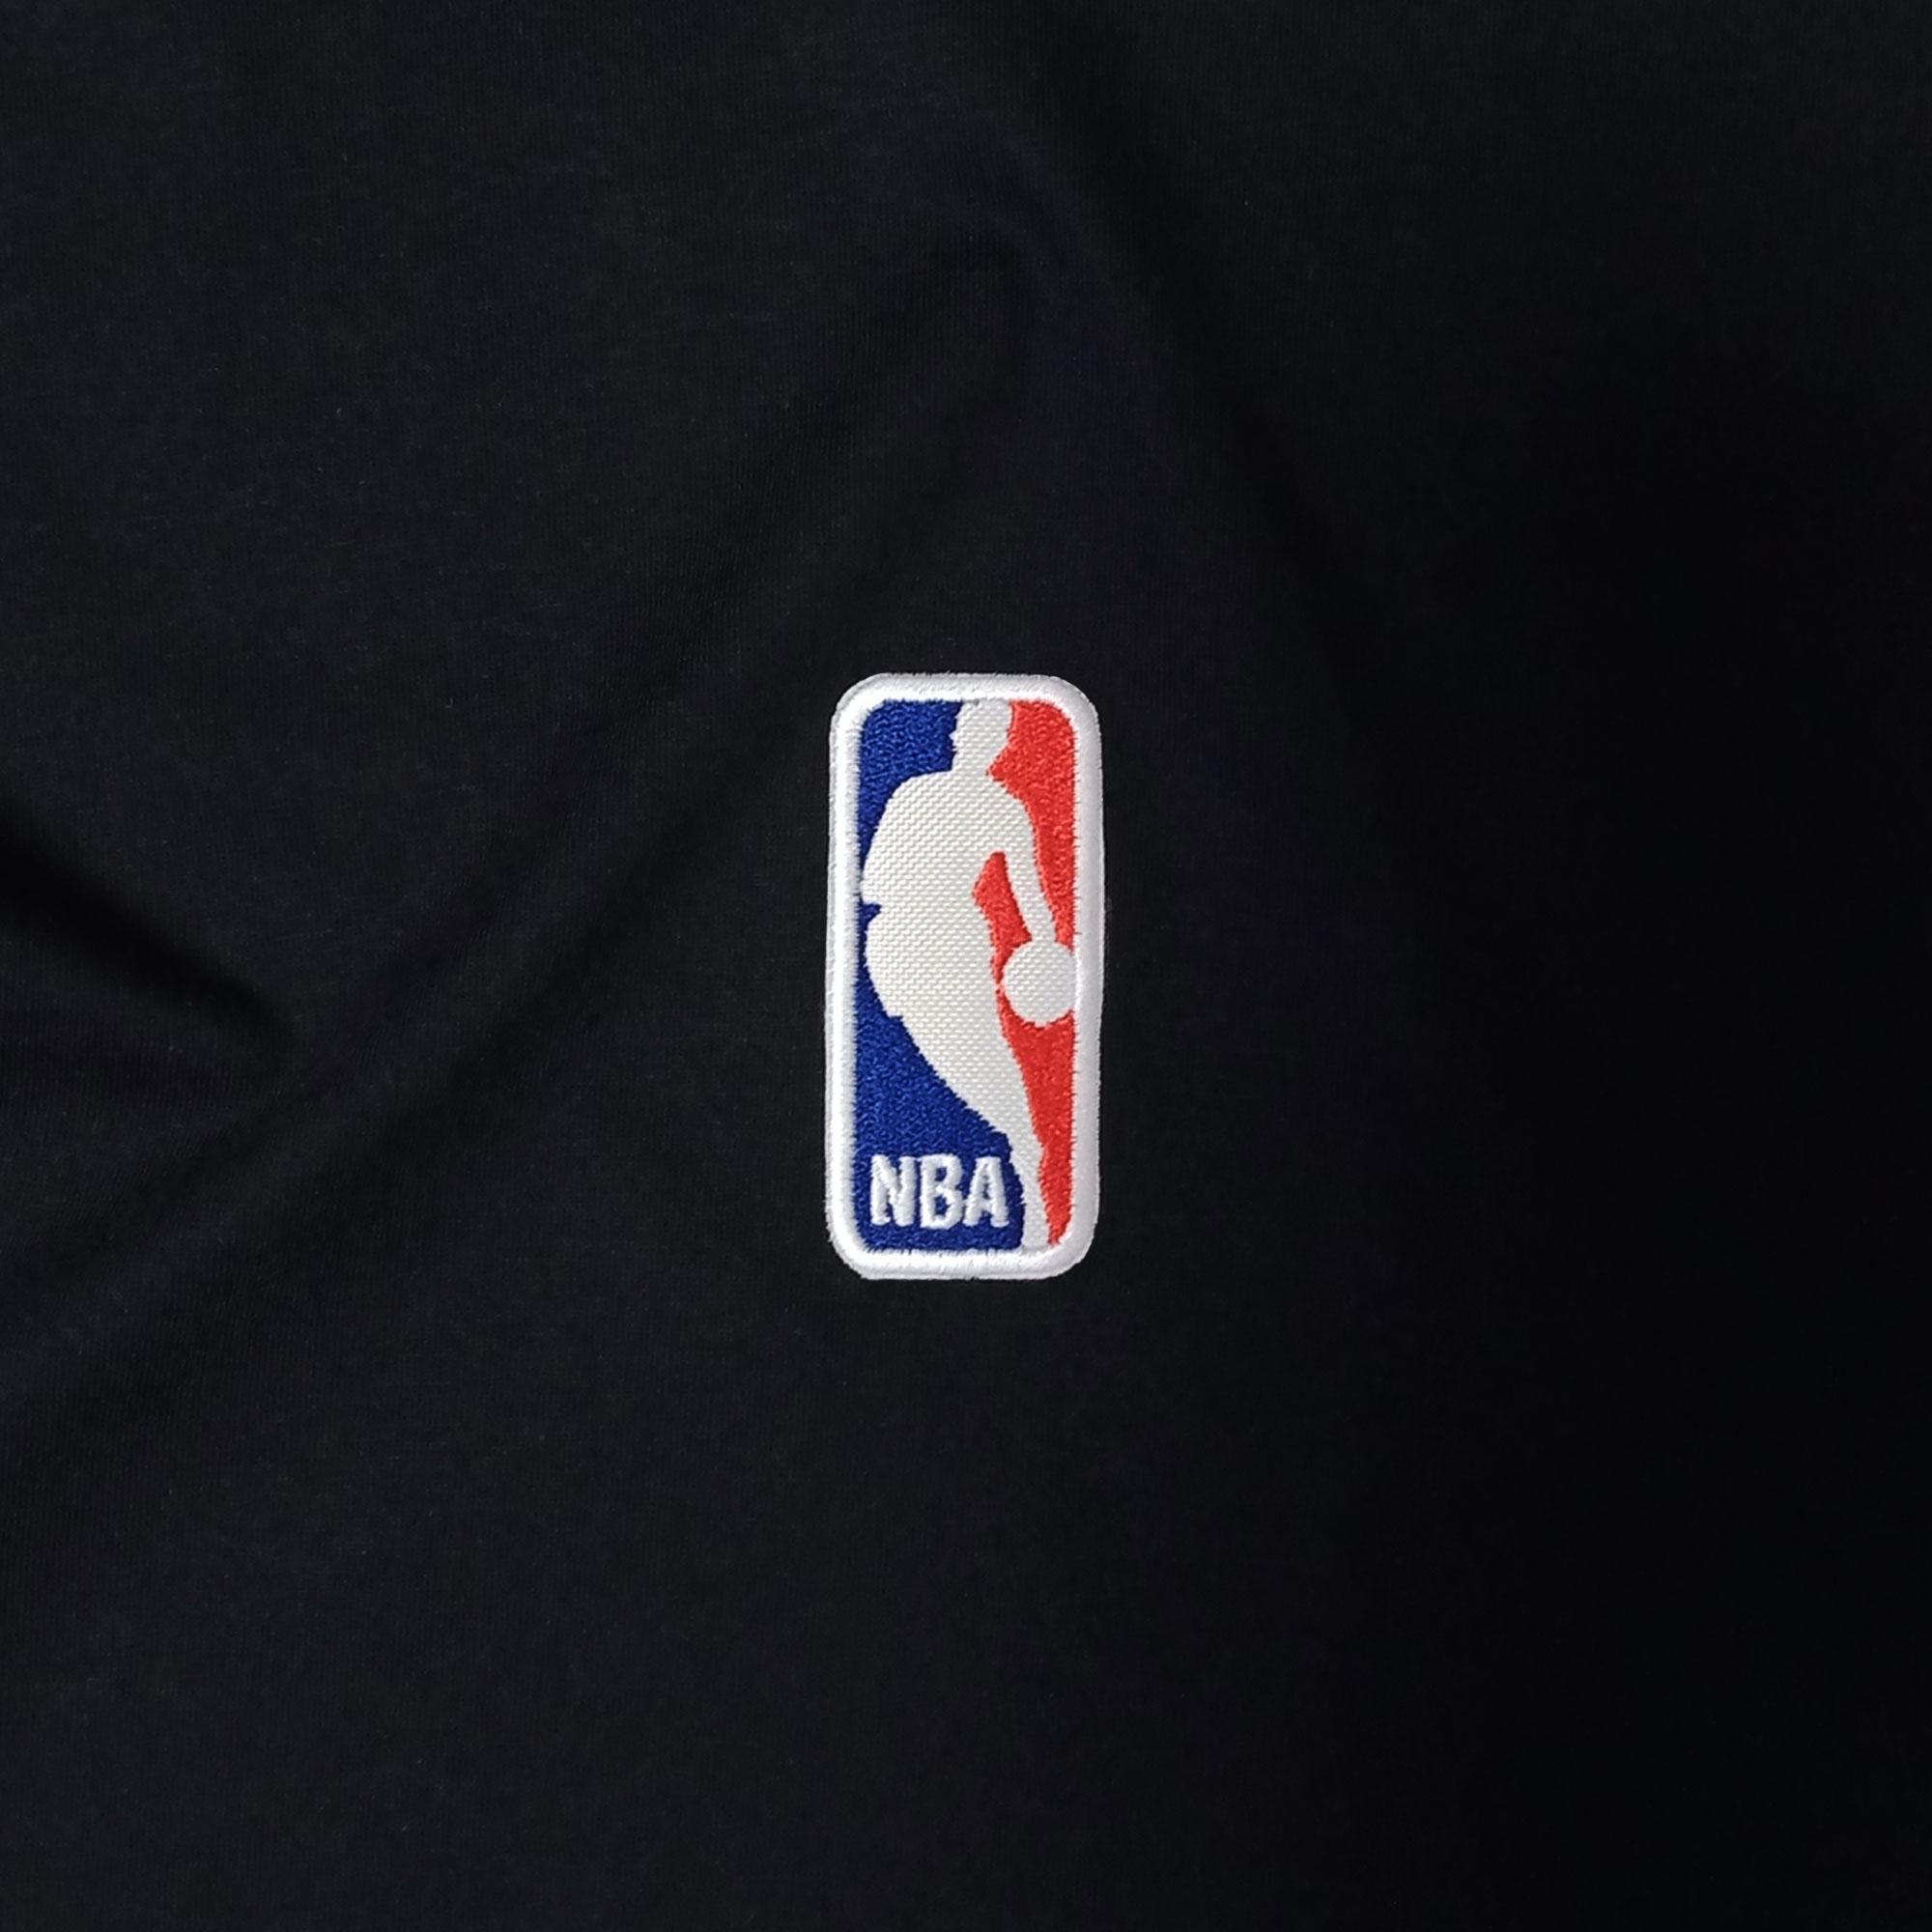 Nba Logo Gear NBA Logo Basic (Örme)  (BSC-BLC-EMBR-NBA-LOGO)